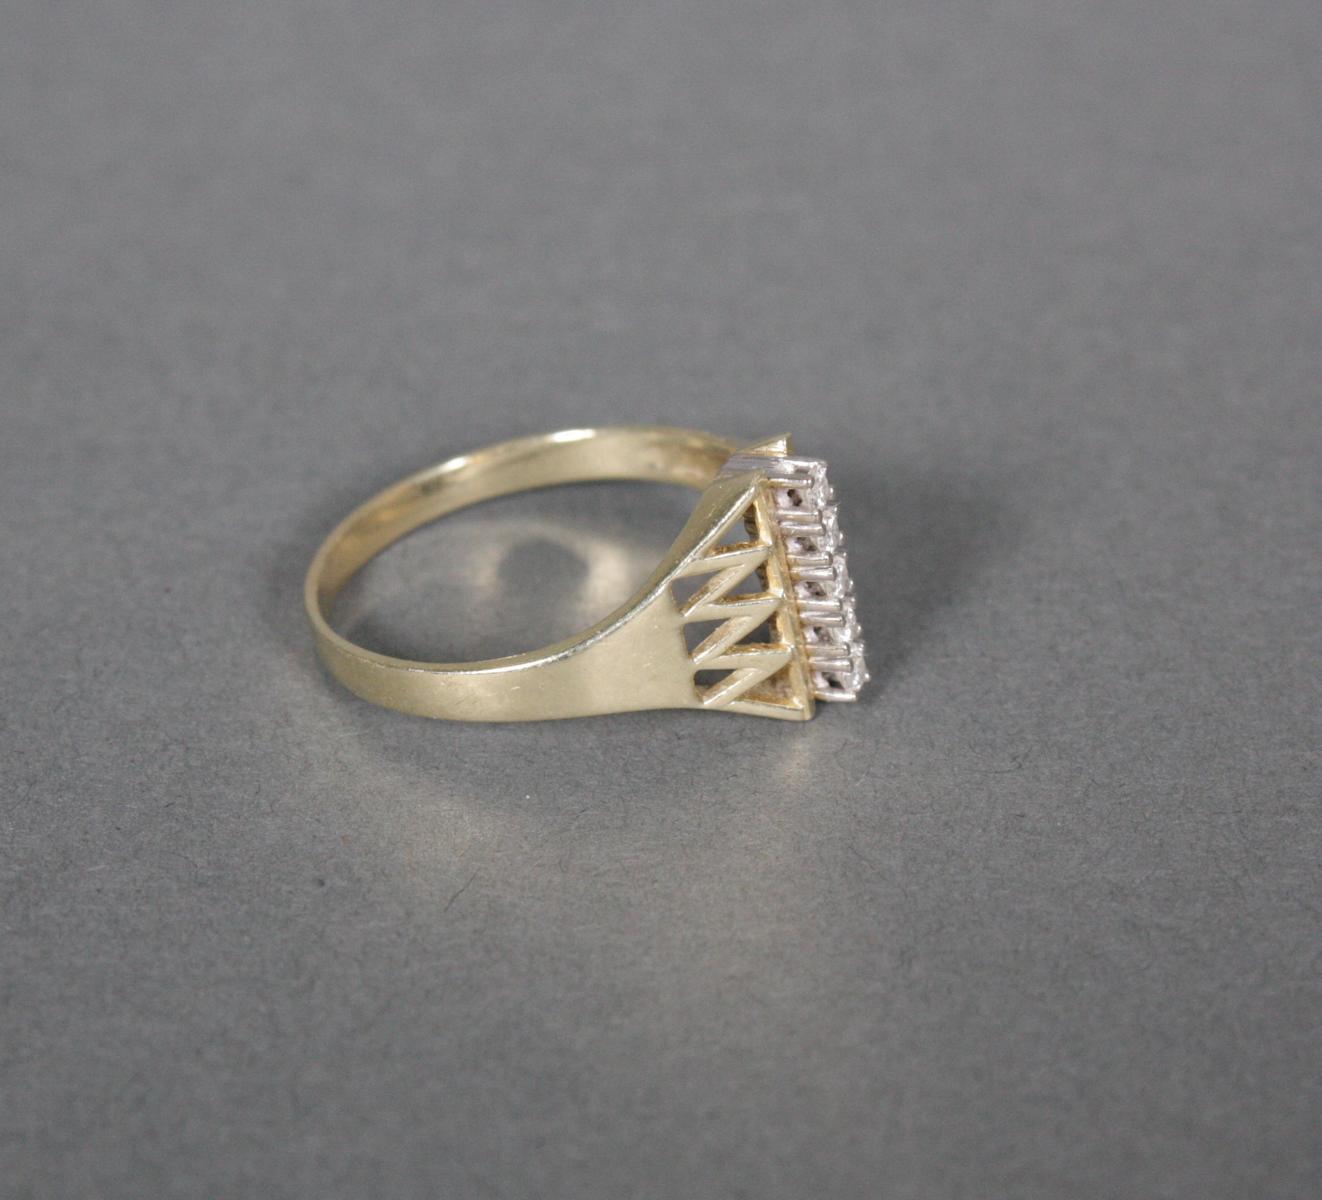 Damenring mit Diamanten, 14 Karat Gelbgold-2